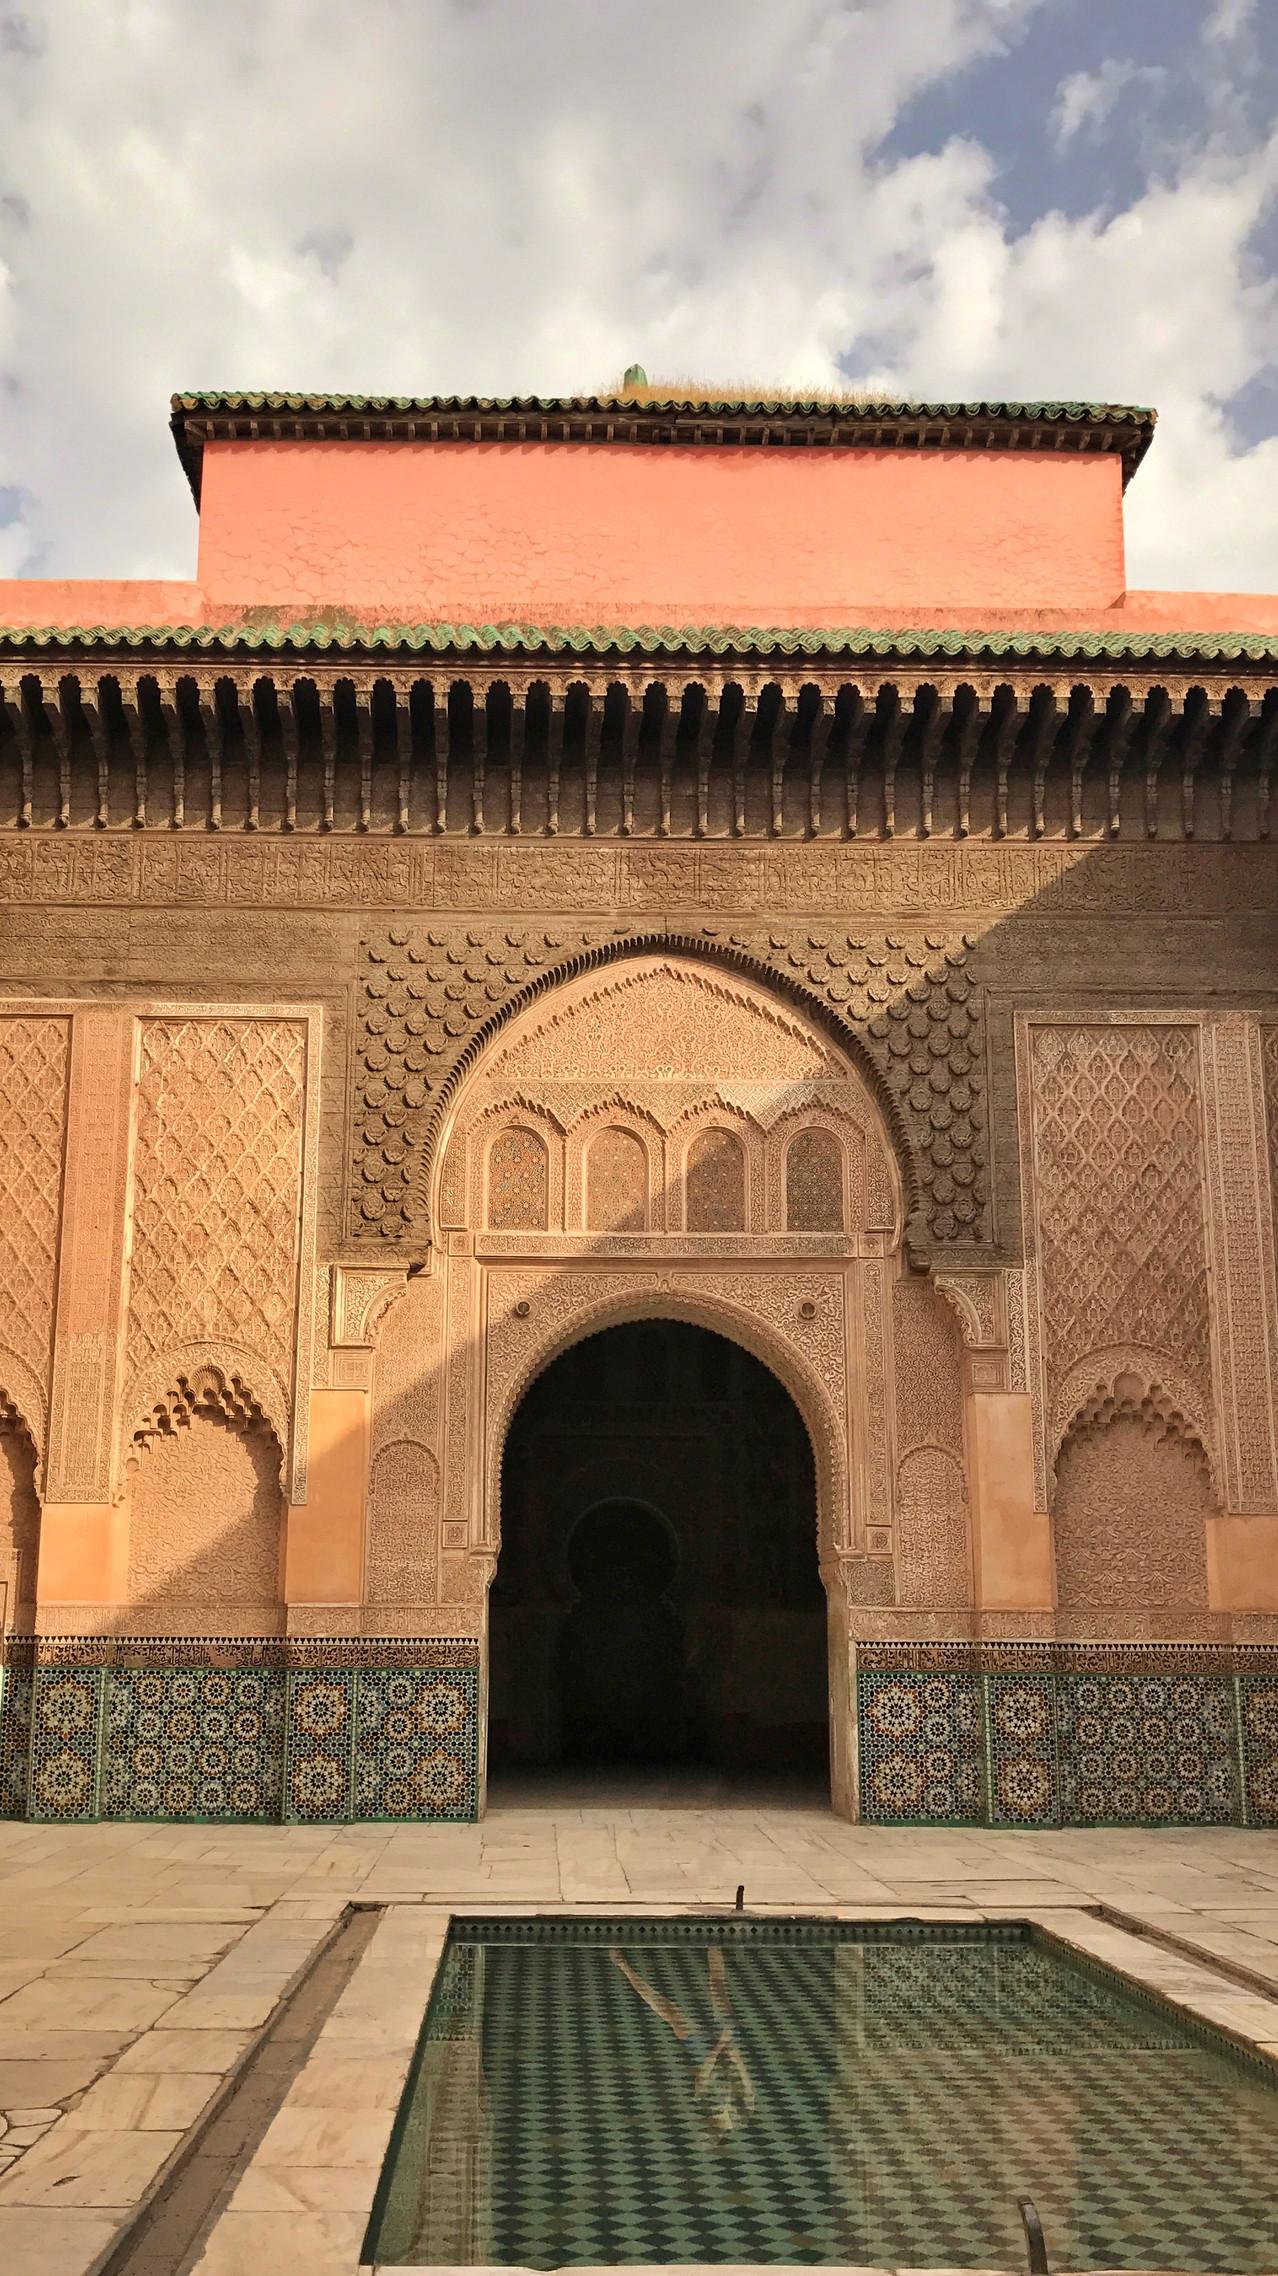 Patio central de la madraza Ben Yousseff en Marrakech